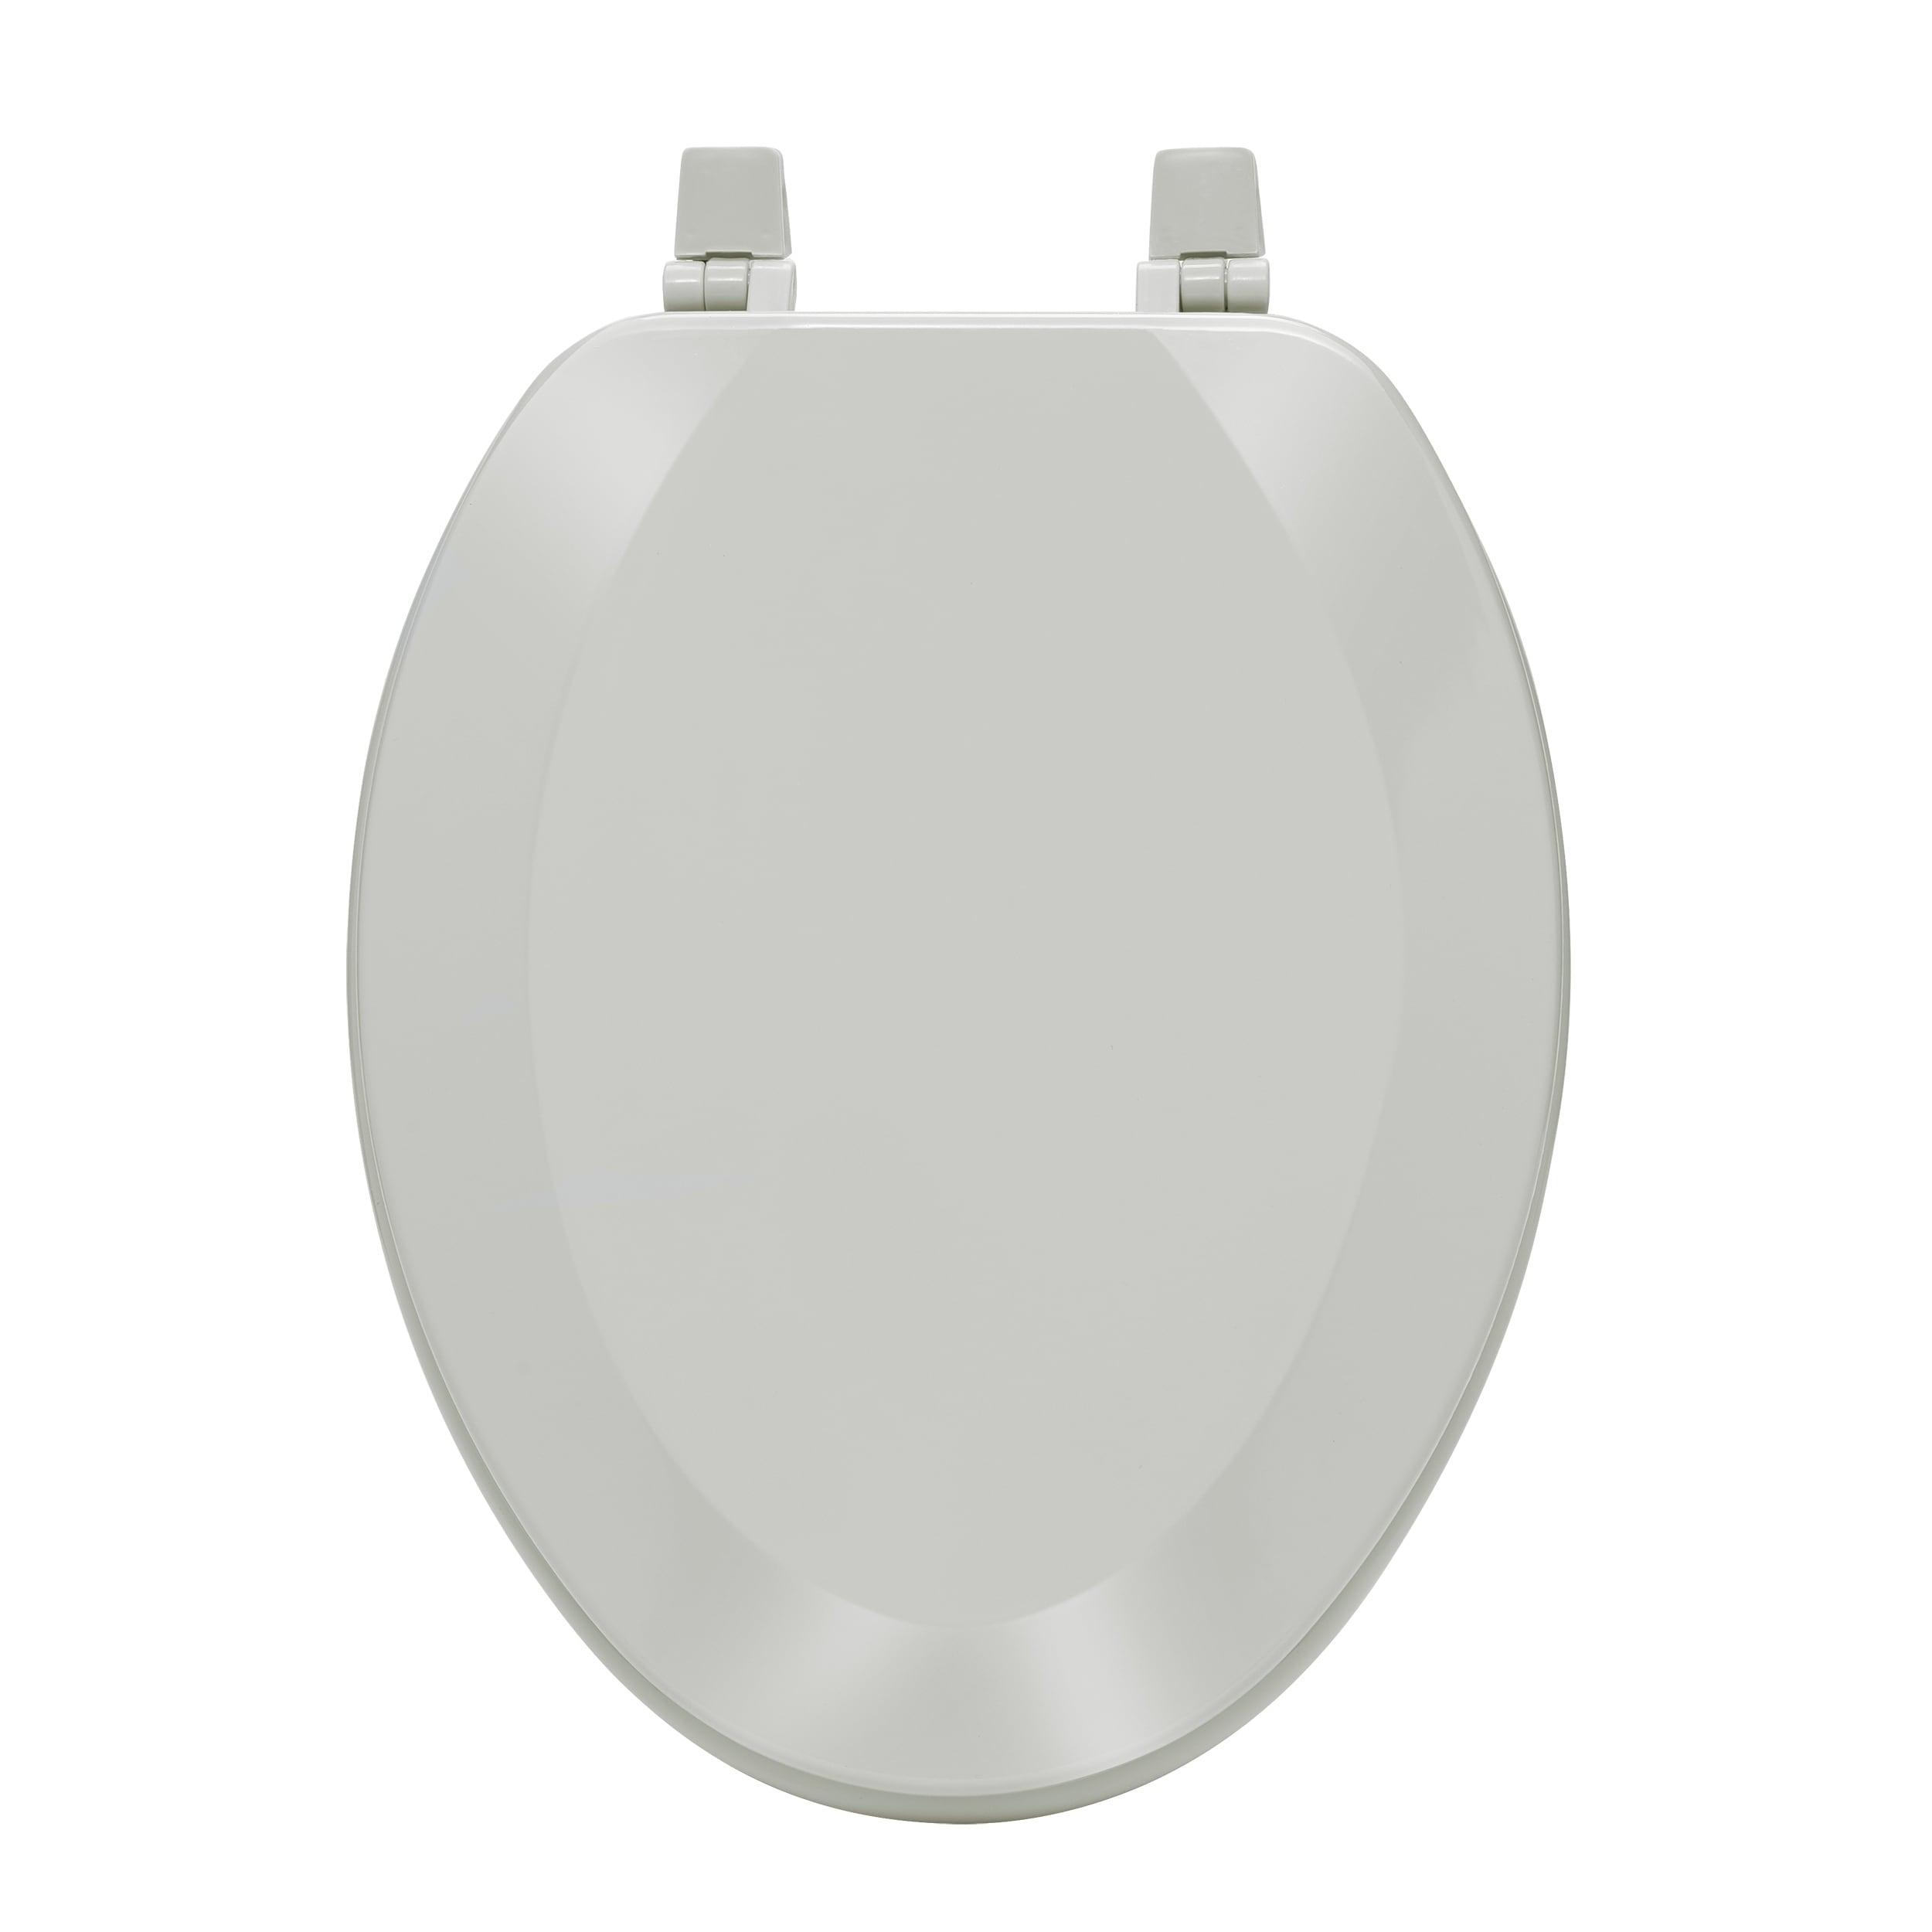 Fantasia 19 Inch White Soft Elongated Vinyl Toilet Seat